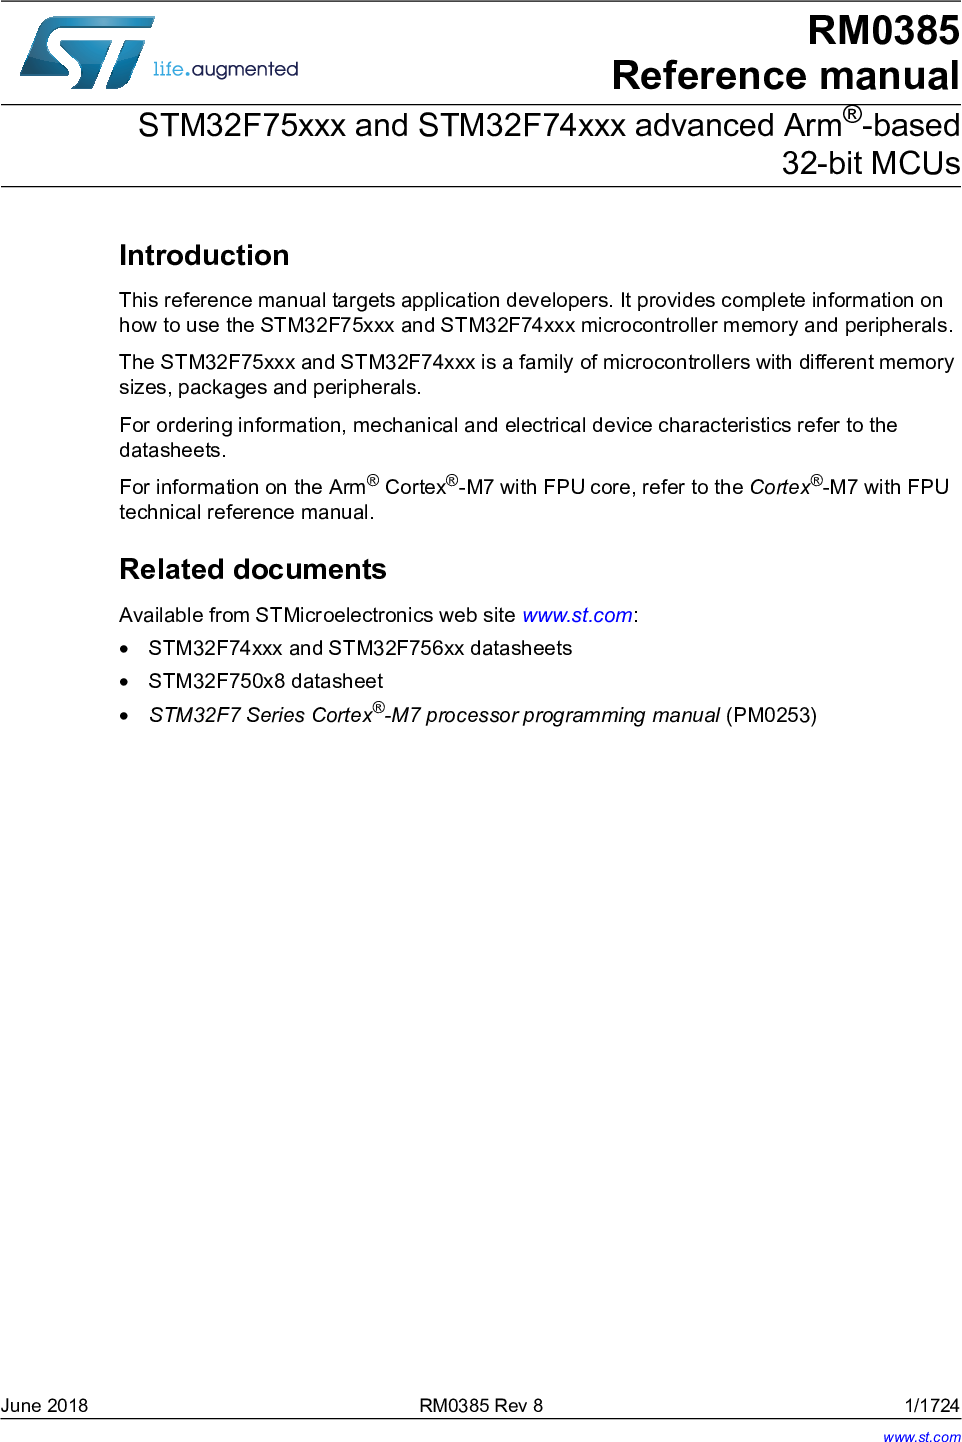 STM32F75xxx And STM32F74xxx Advanced Arm® based 32 bit MCUs